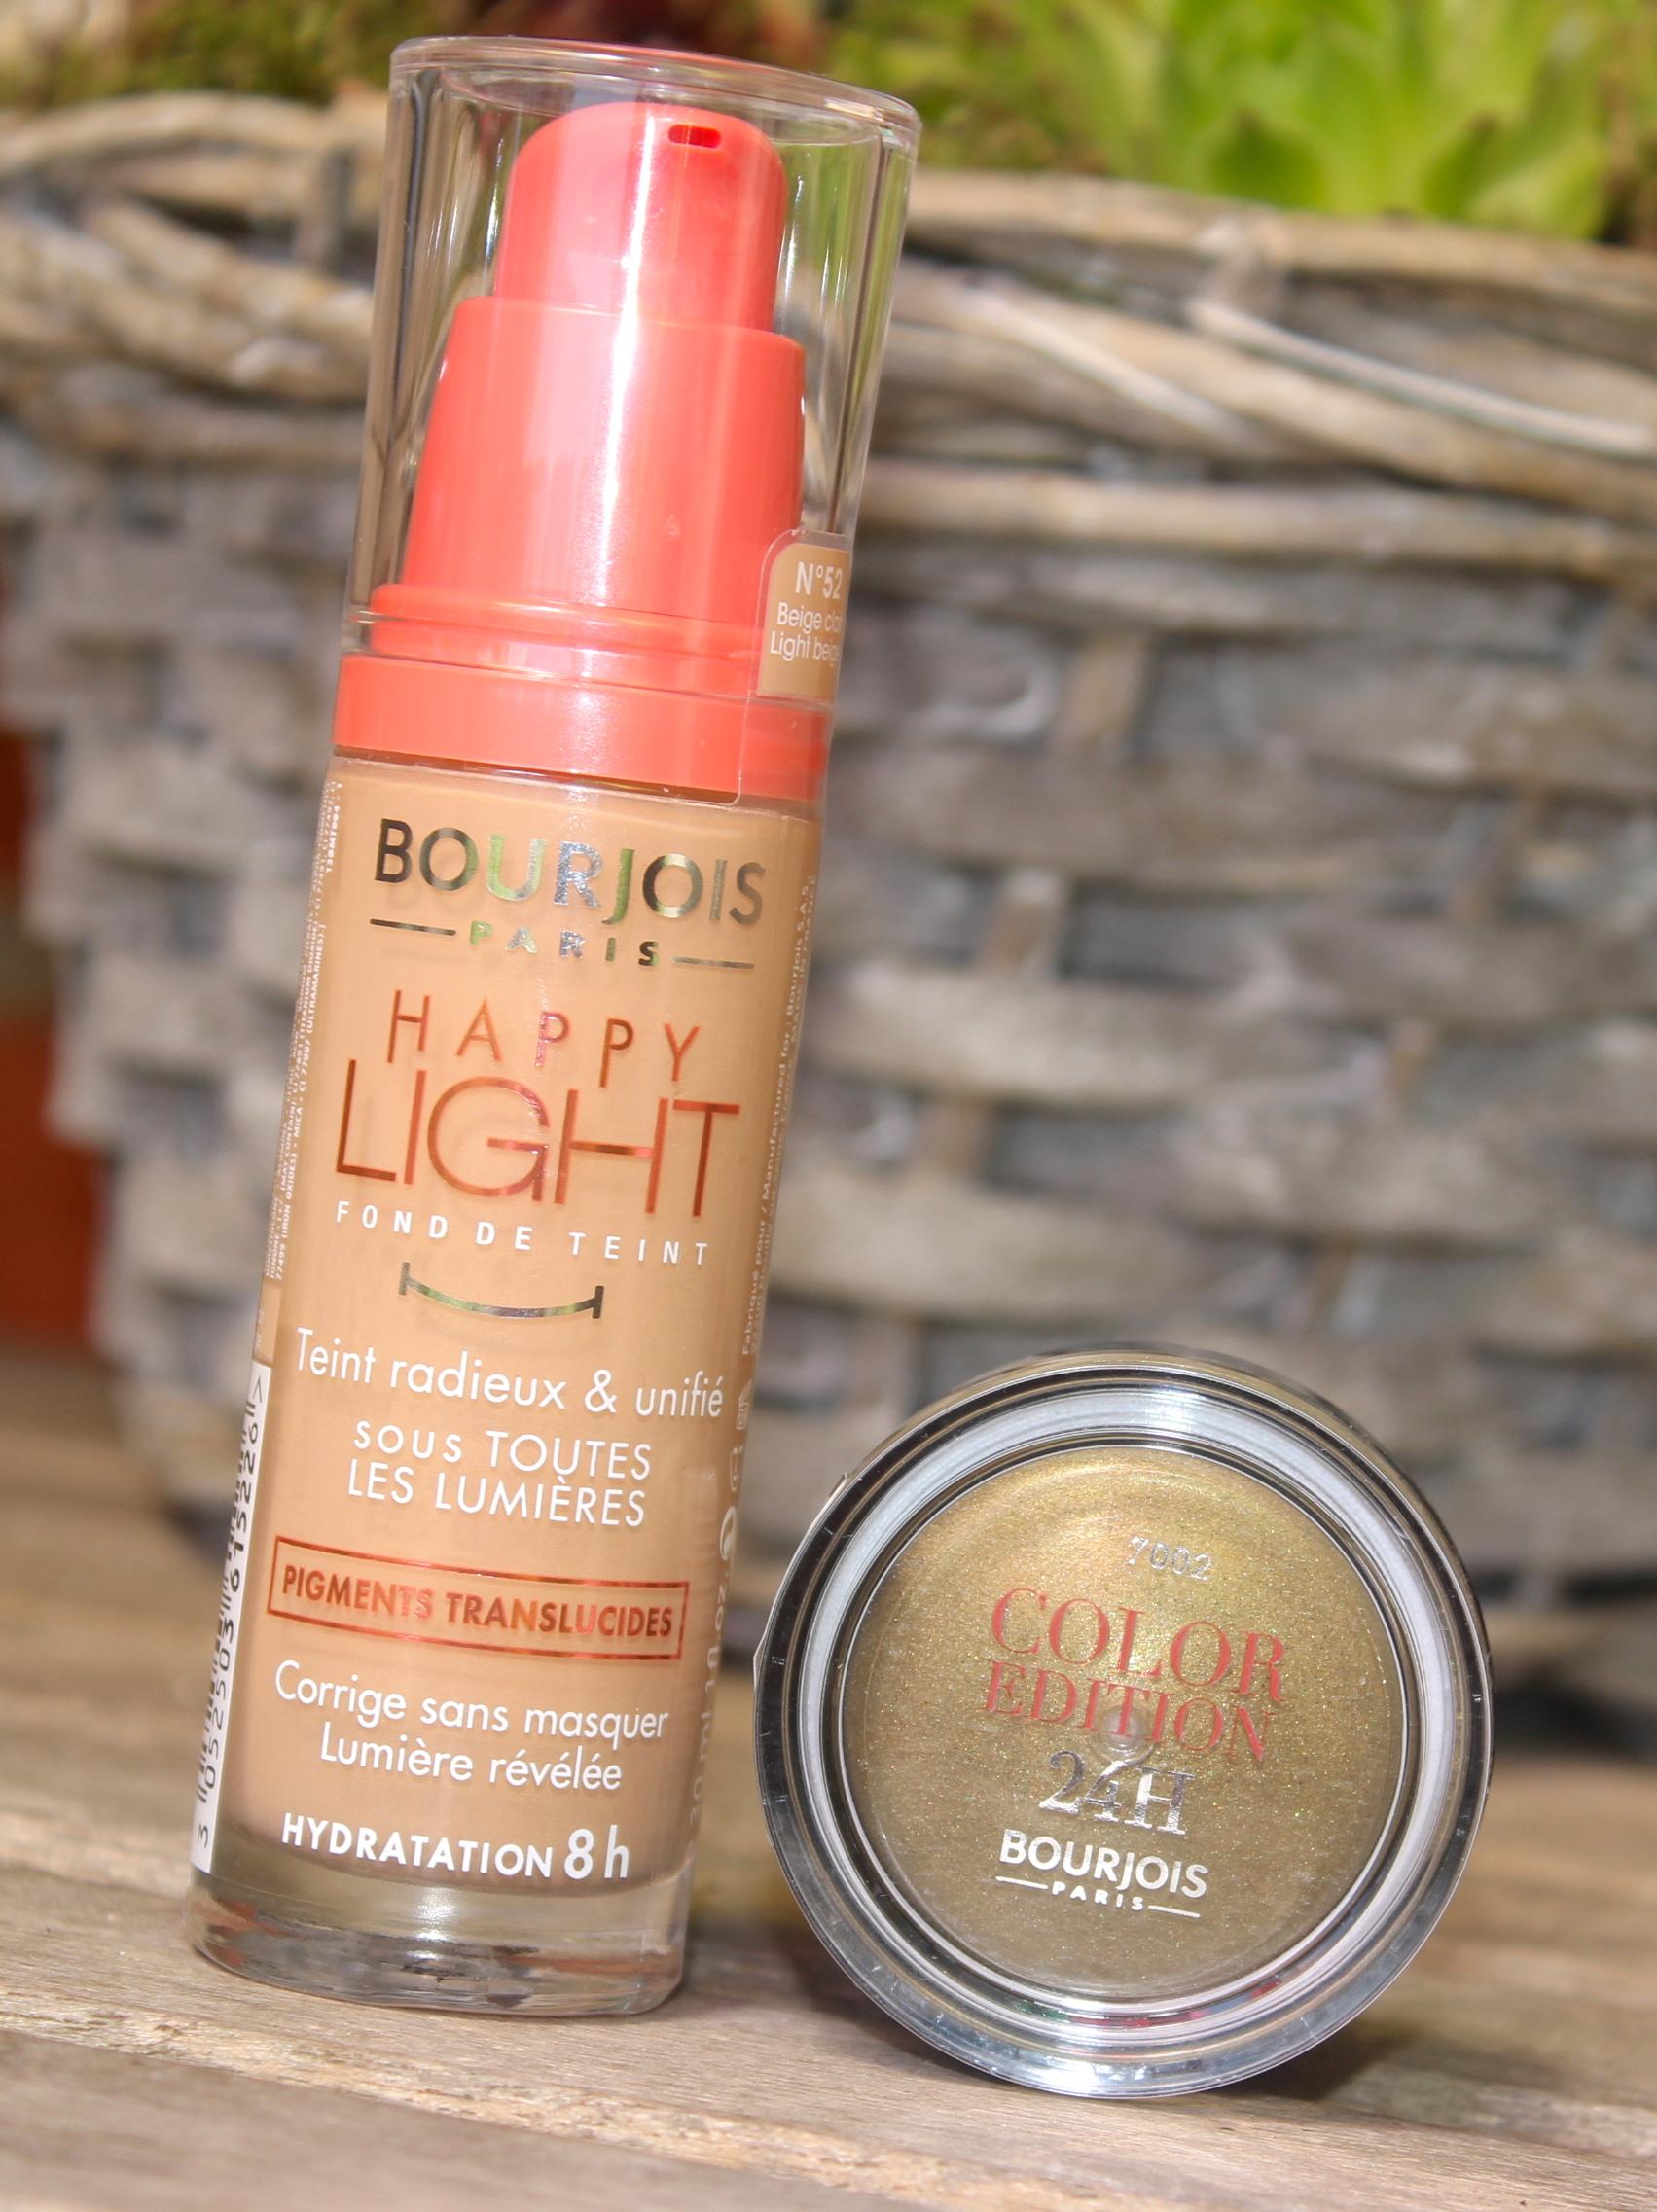 Bourjoist happy light foundation n52 light beige Color edition 24h kaki cheri